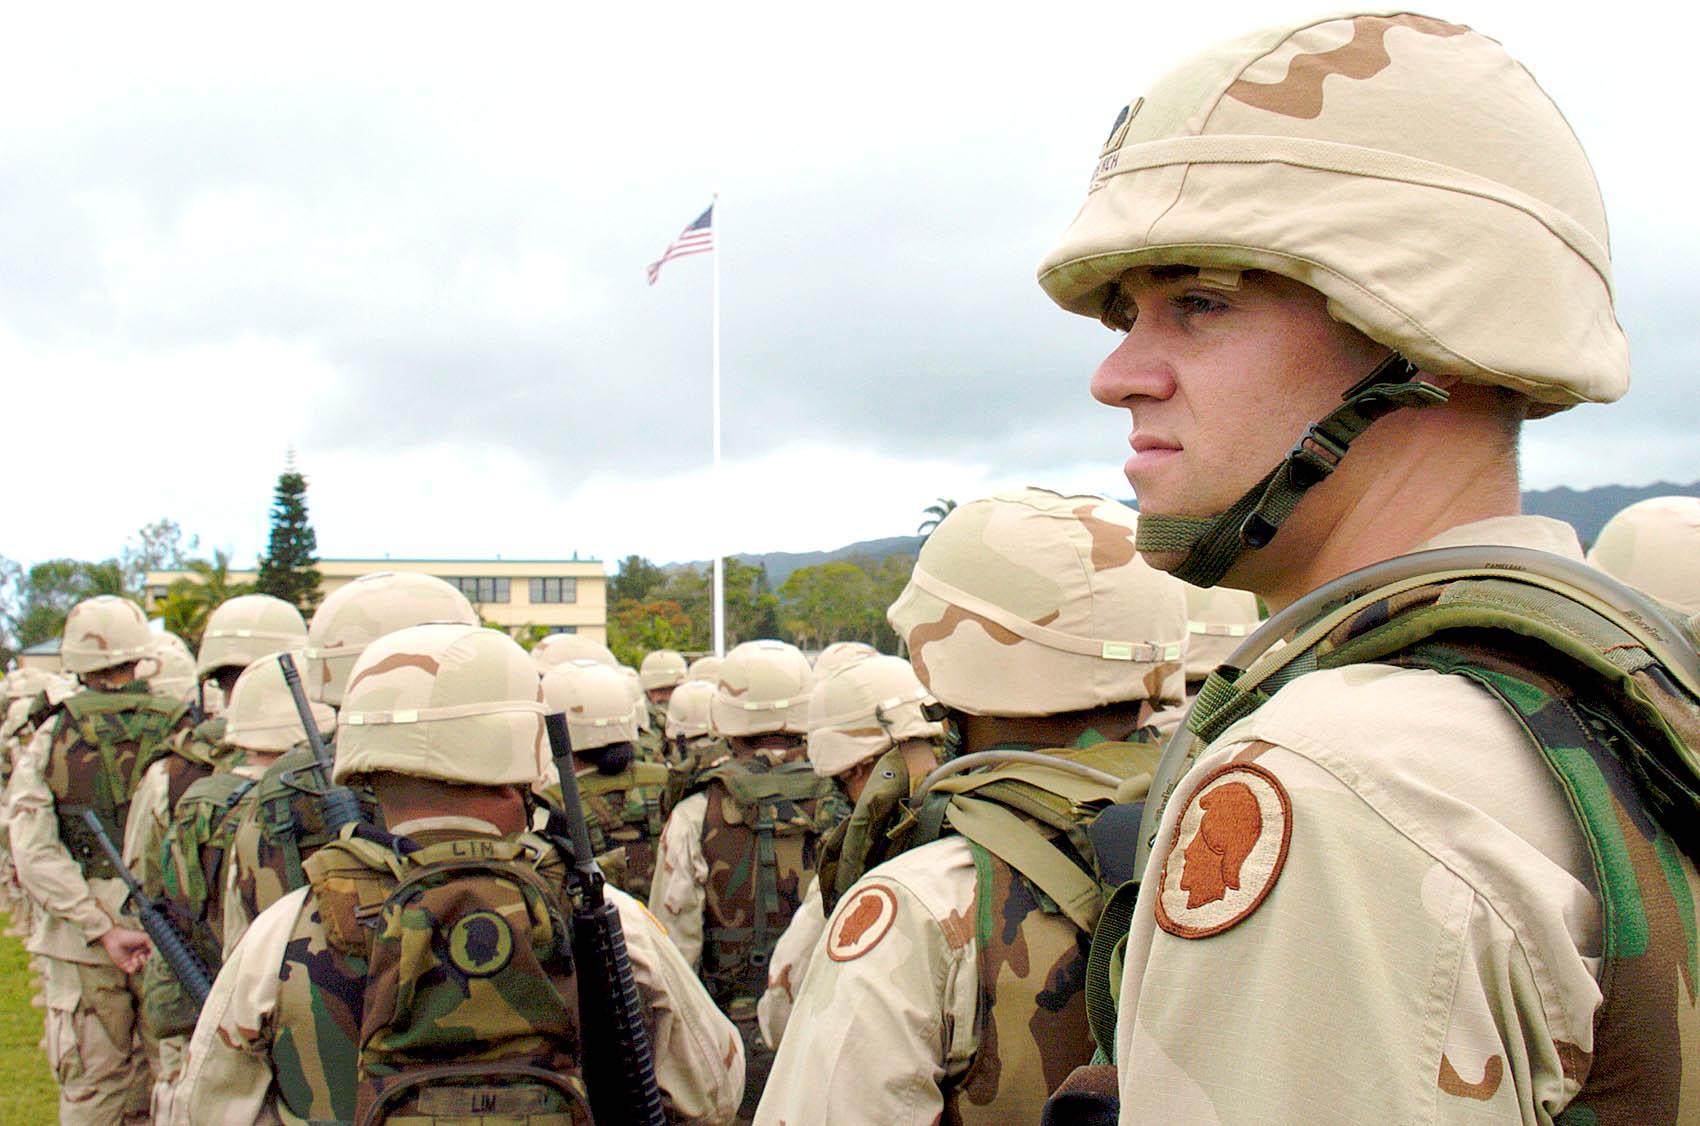 Amerikai katonák PASGT sisakban, 2004. Forrás: 25idl.army.mil